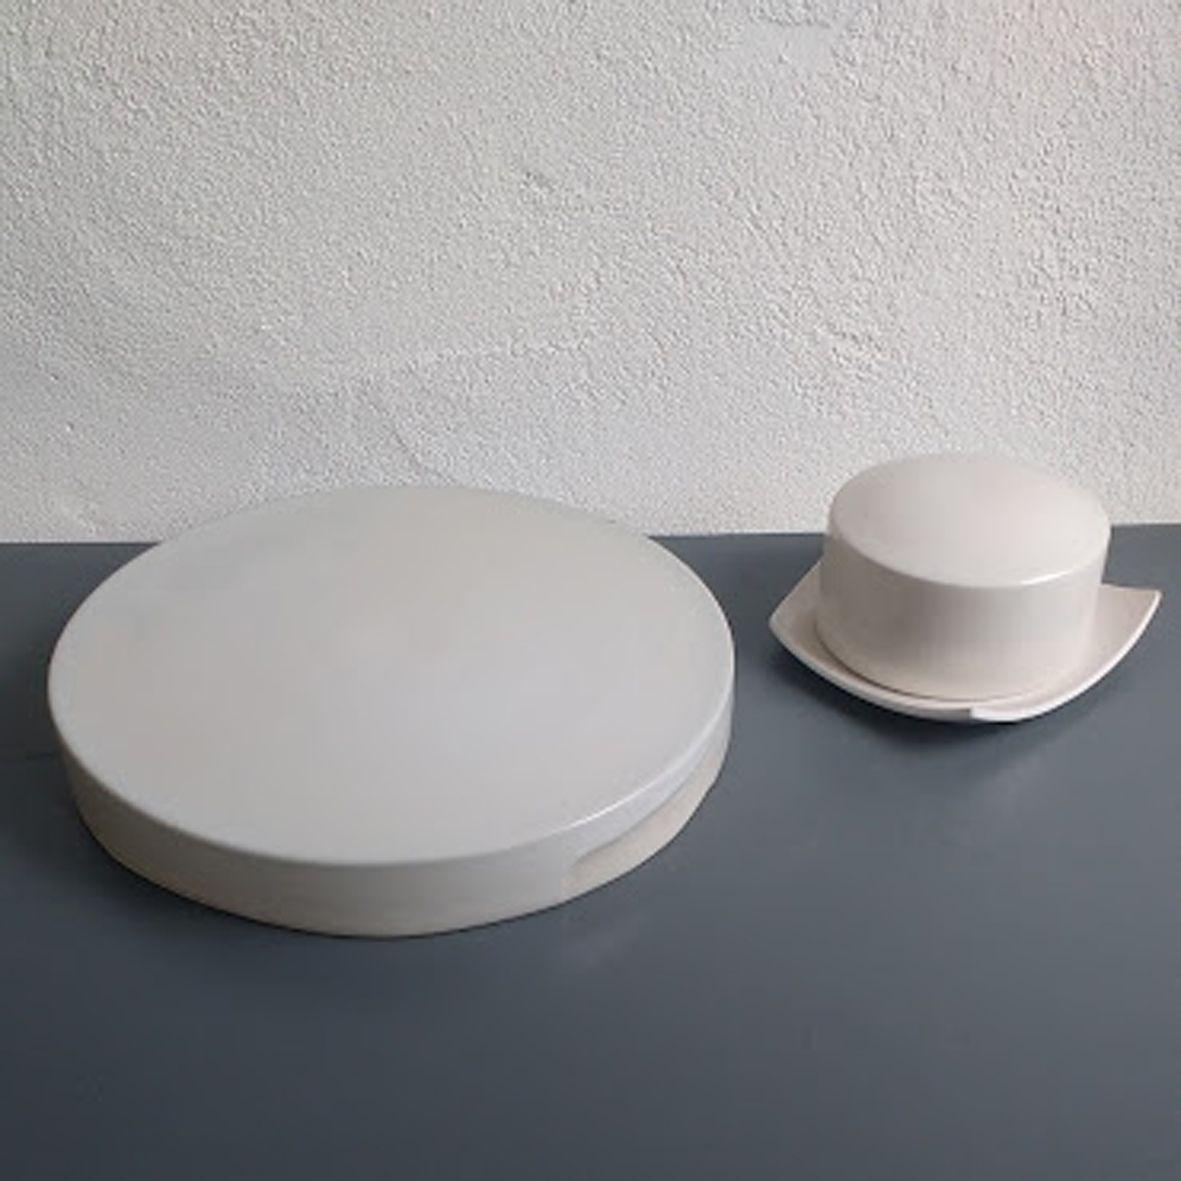 New Work Limited Edition Designs Jane Sarre Ceramics New Work Design Simple Pleasures